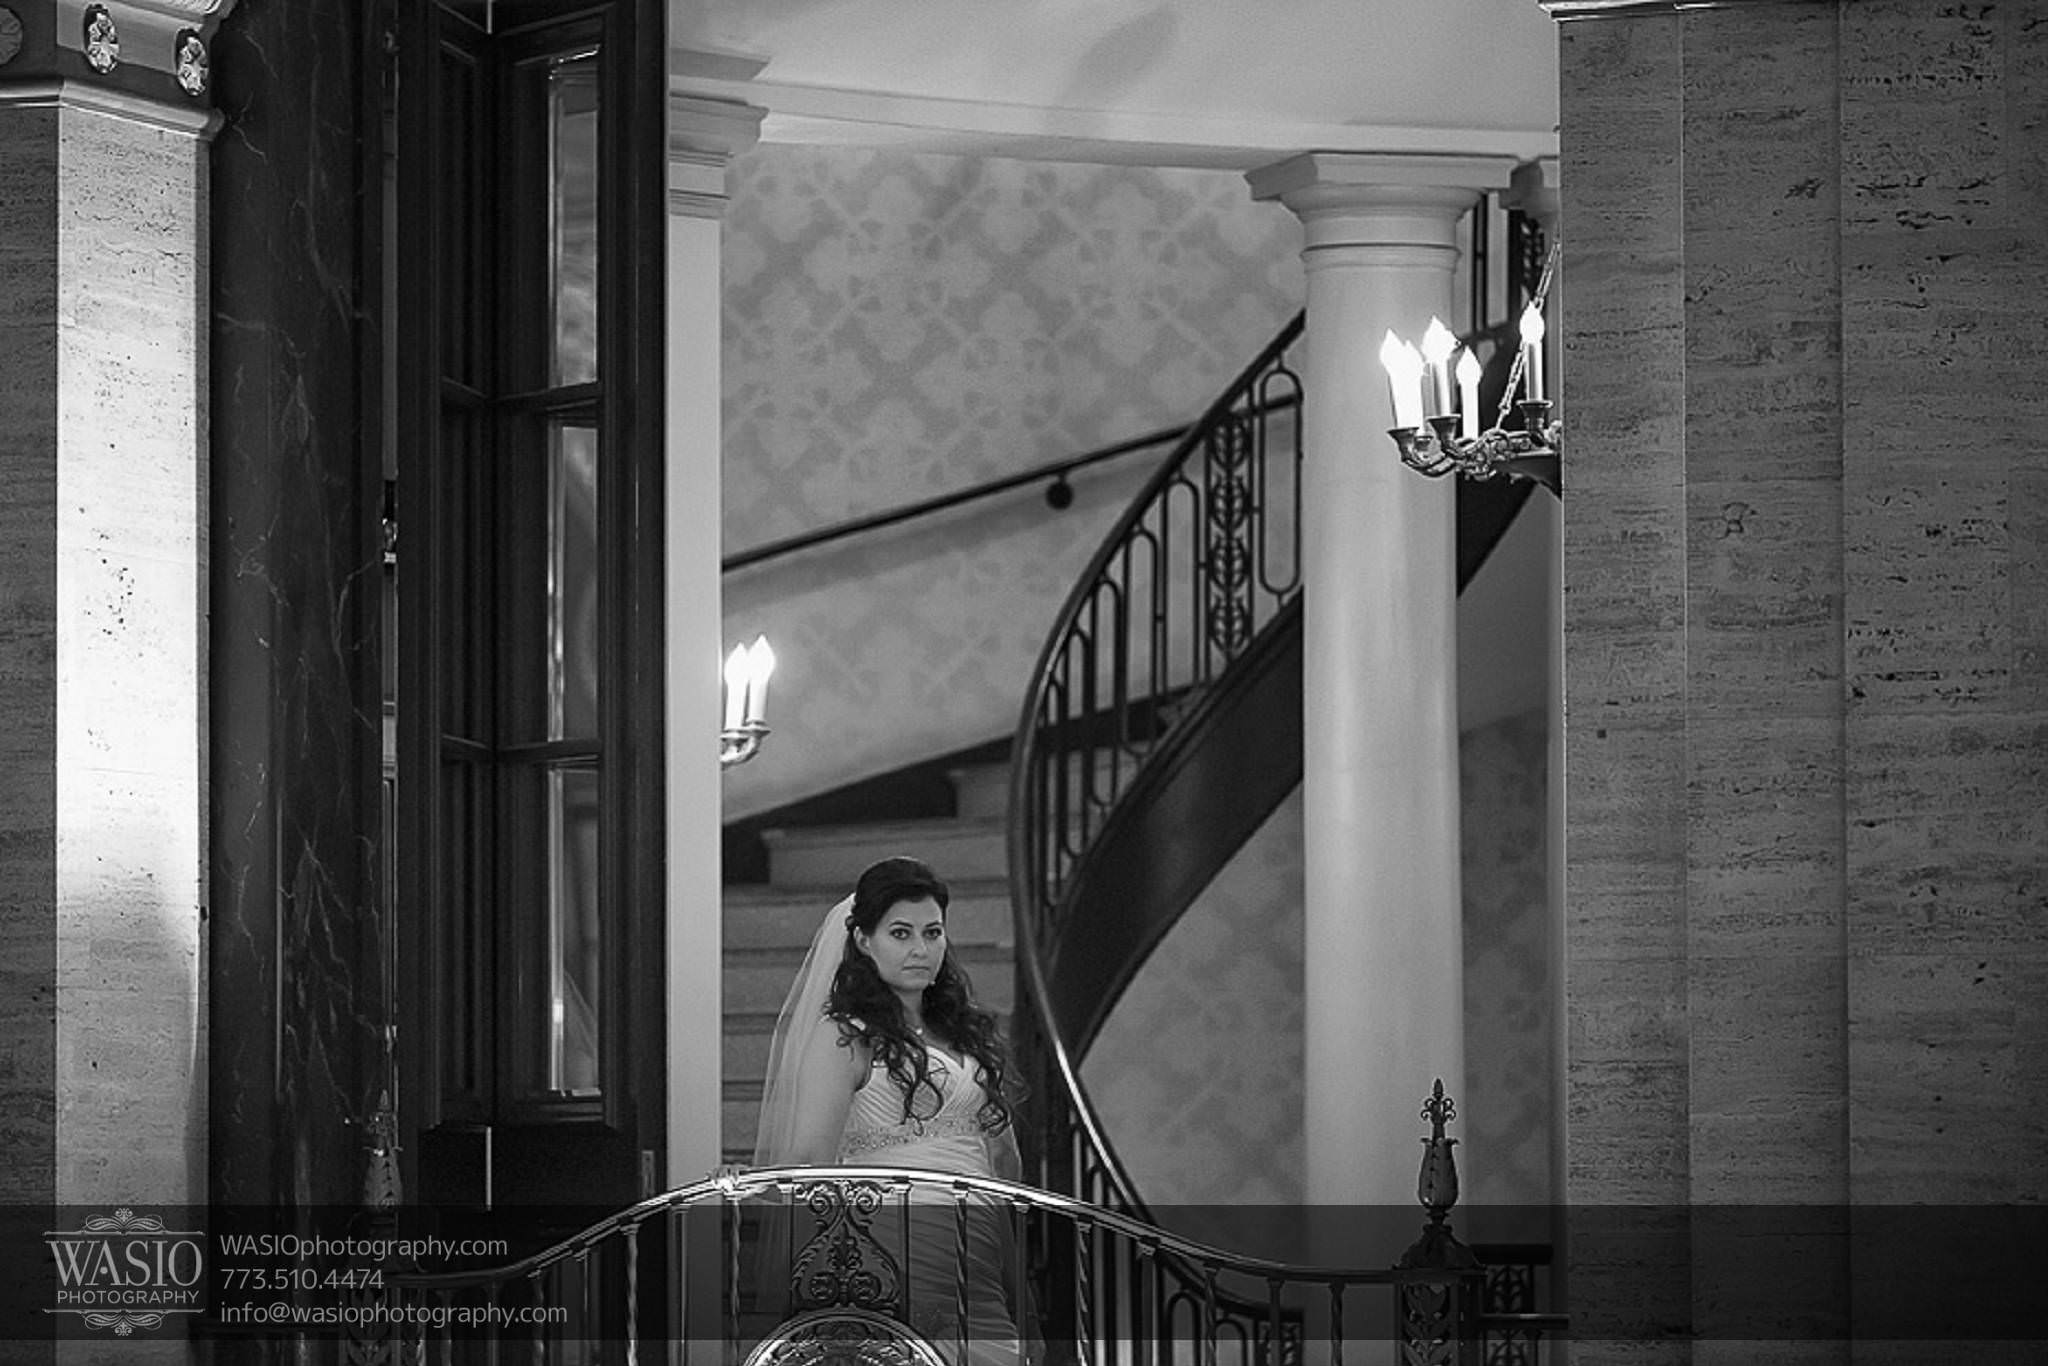 Chicago-wedding-photos-anticipation-historic-first-look-balcony-stairs-050 Chicago Wedding Photos - Svetlana + Yuriy